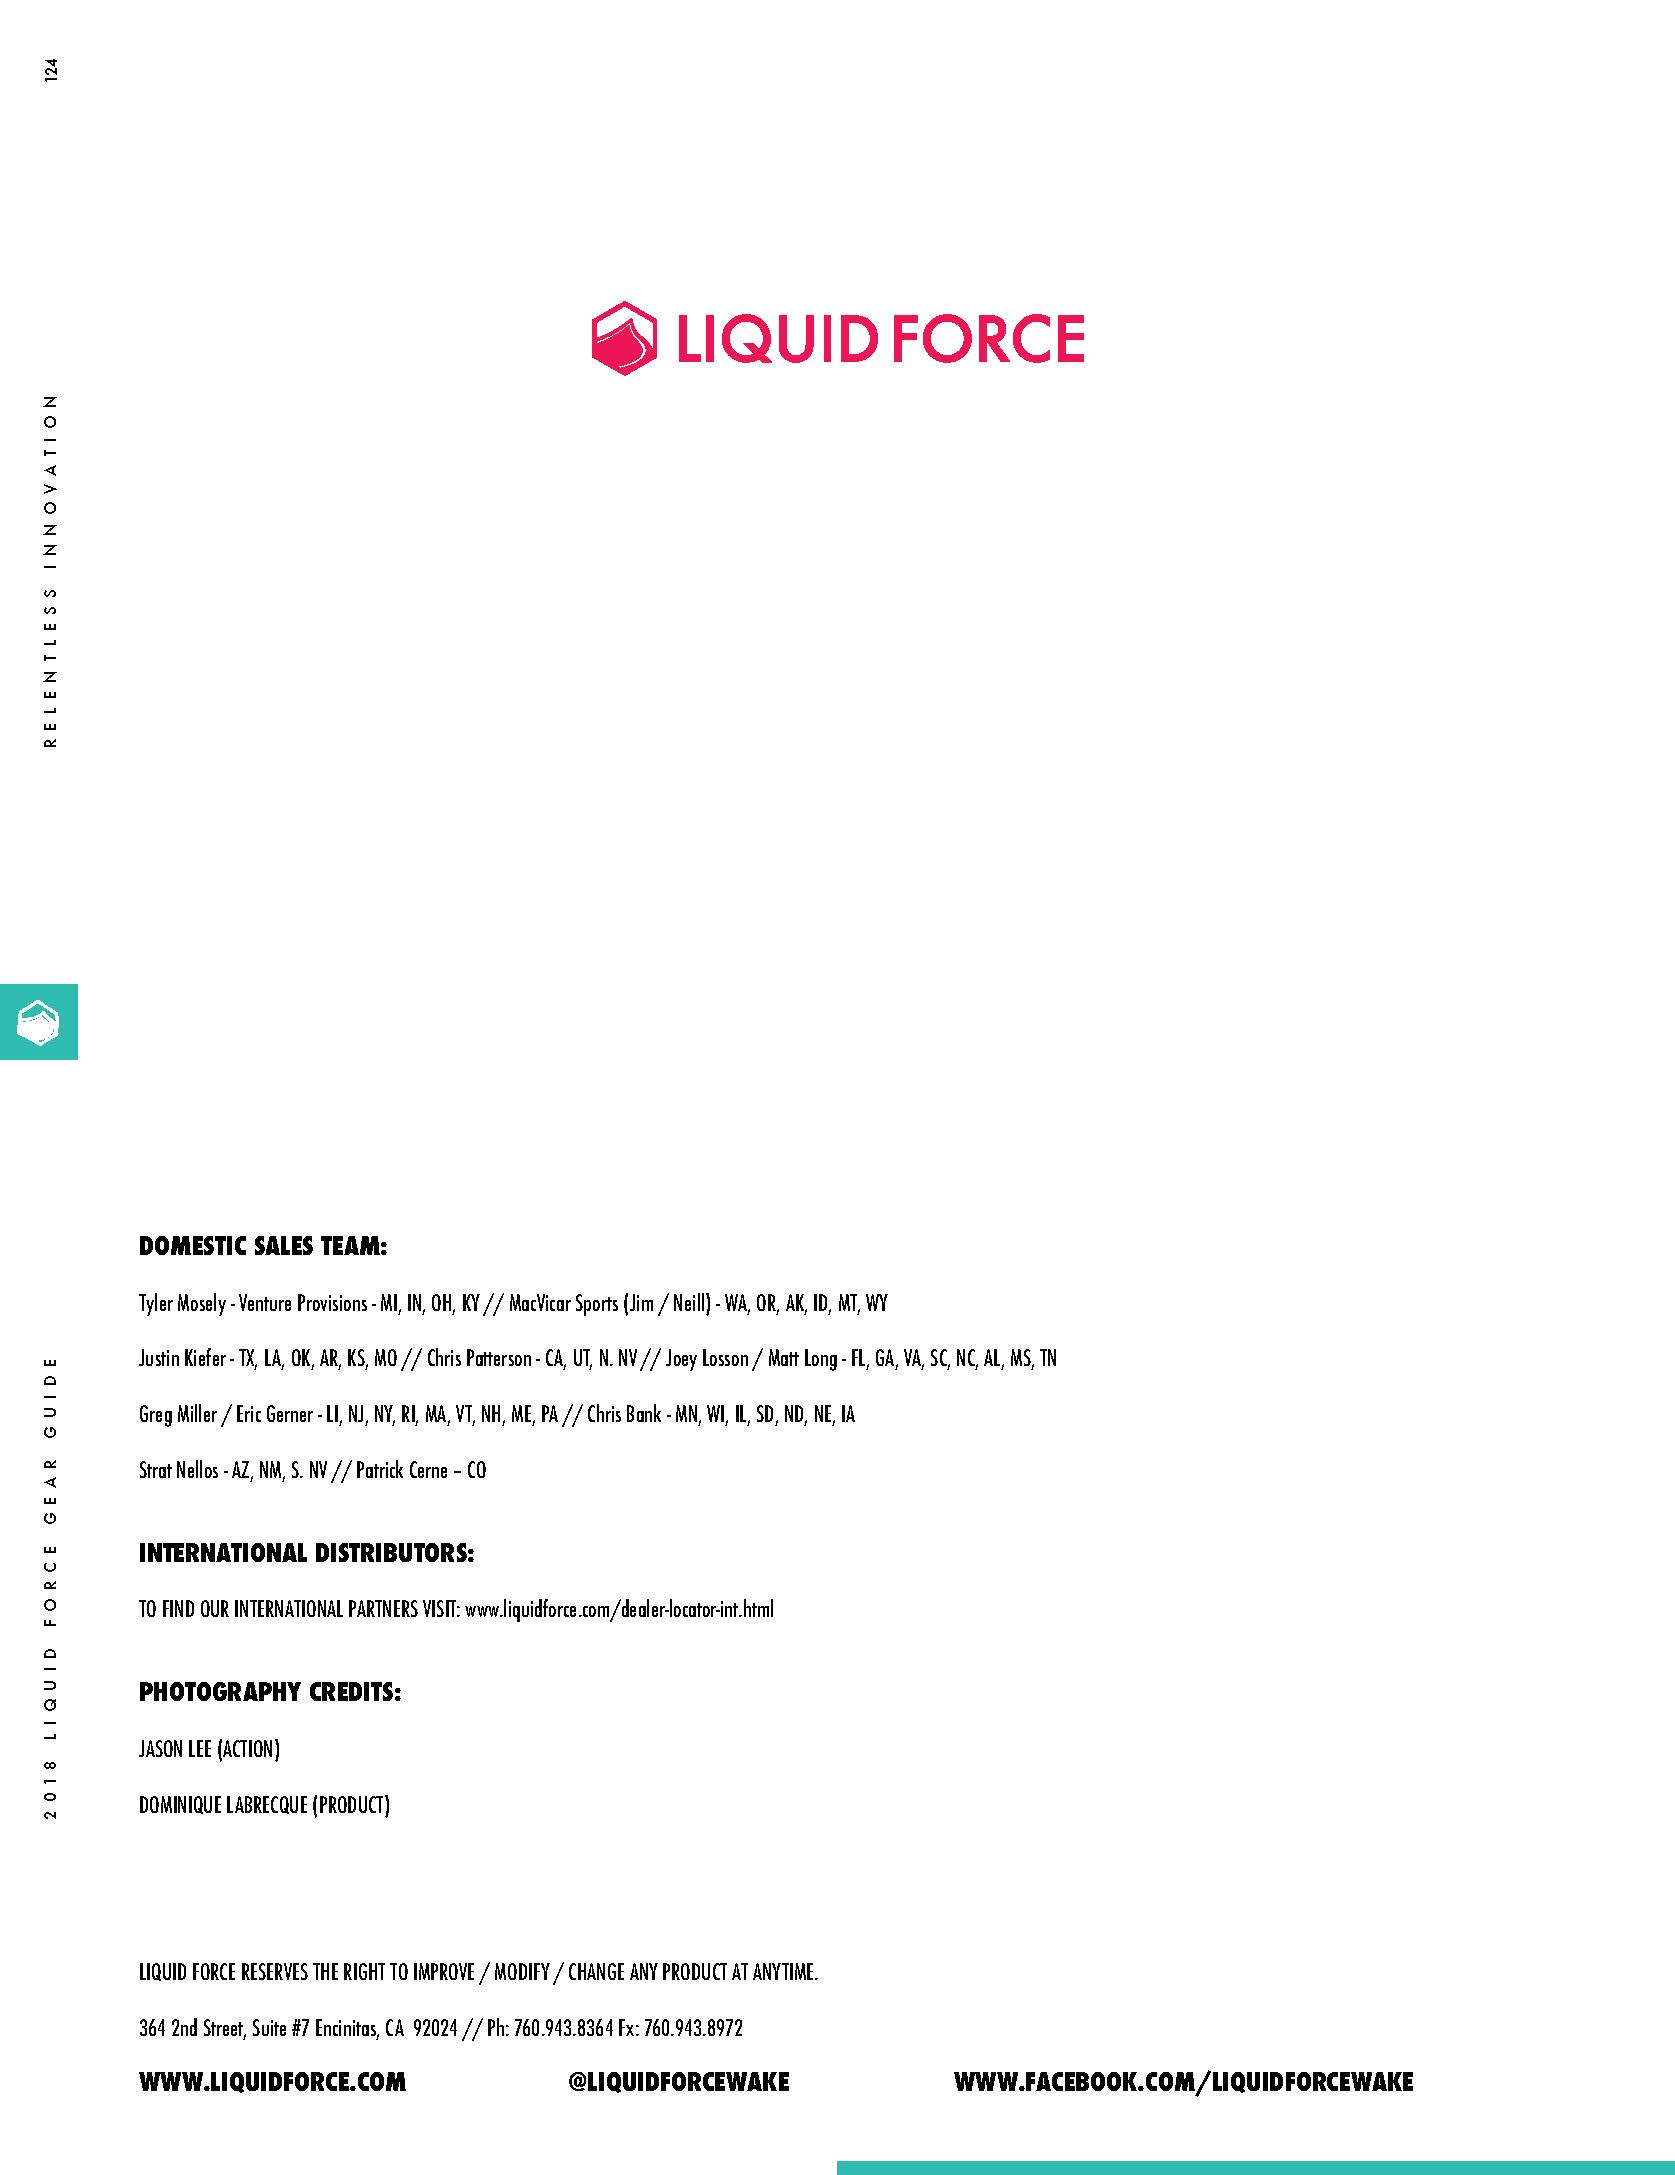 2018_LIQUIDFORCE_PRODUCT CATALOG-DIGITAL_Page_63.jpg